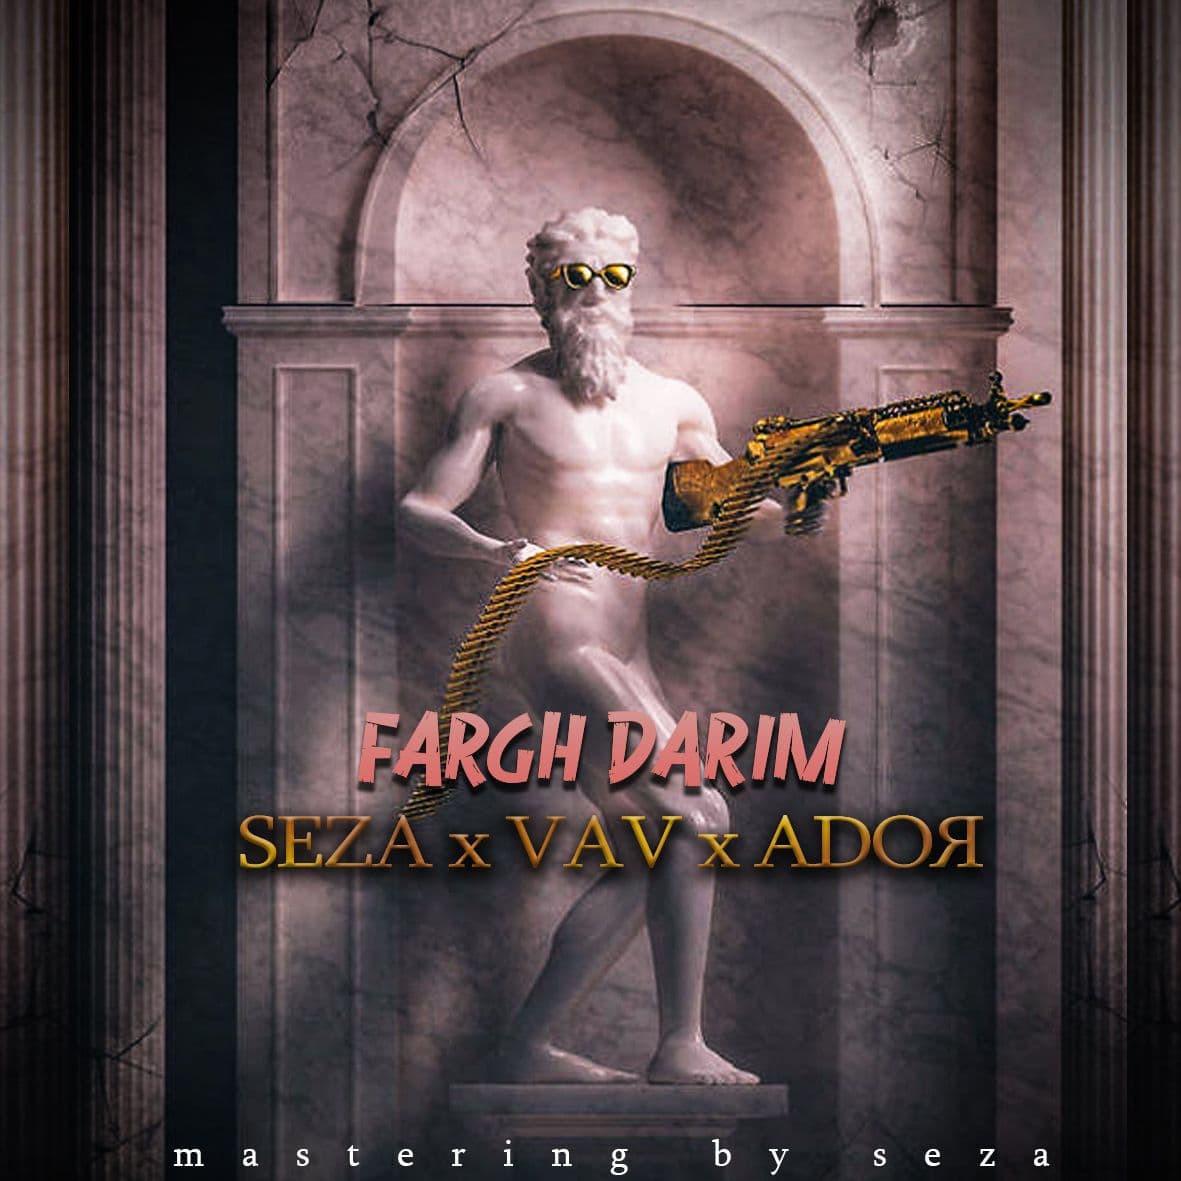 Seza & Vav & Ador - Fargh Darim